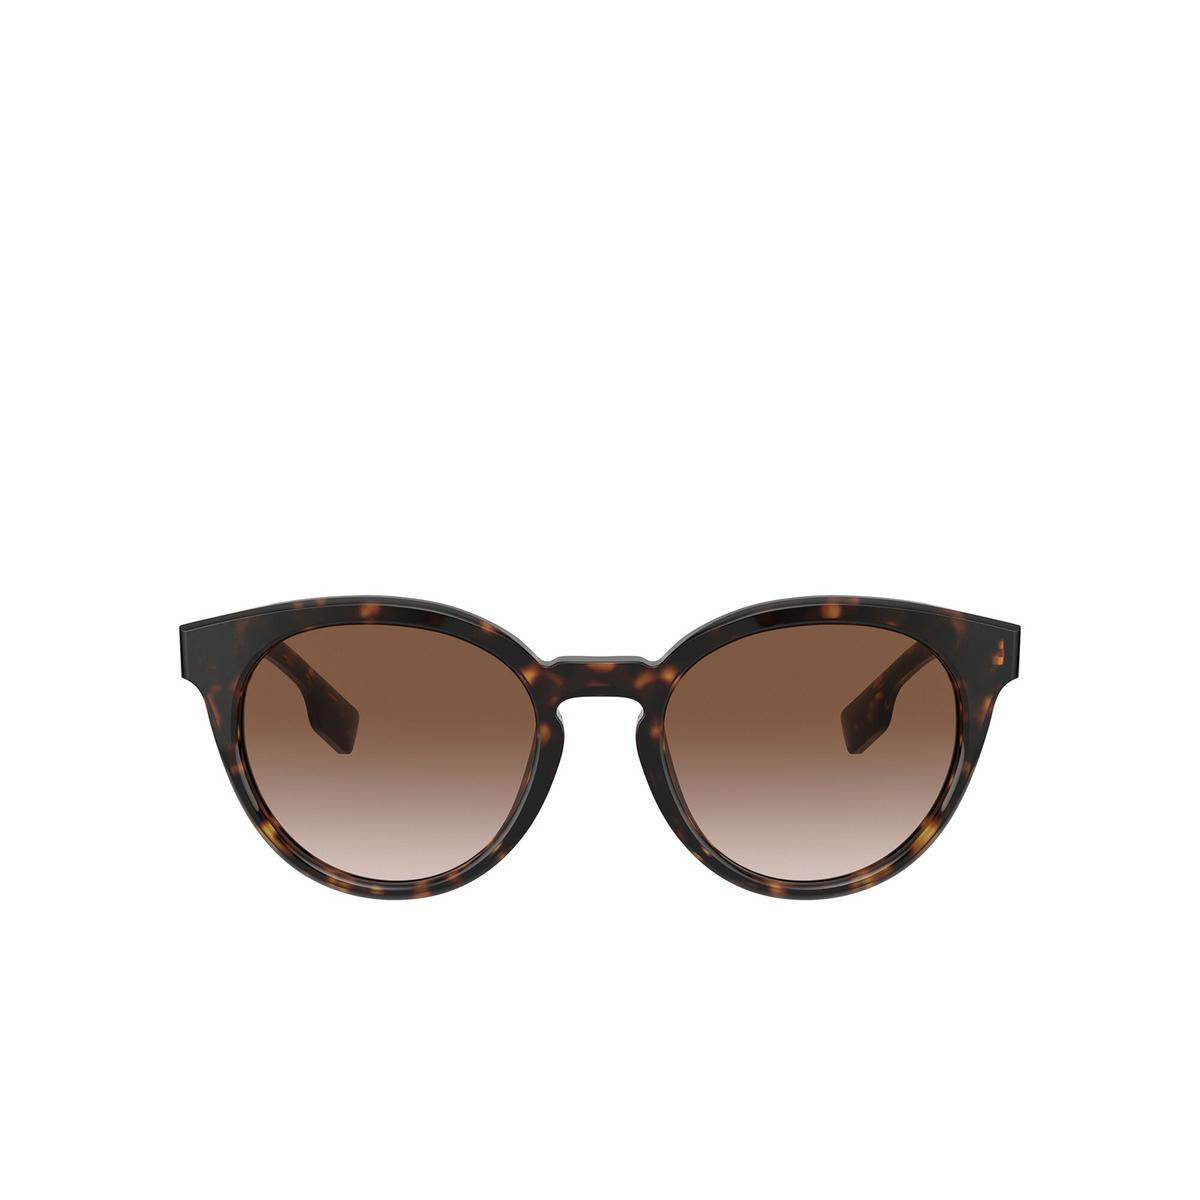 Burberry® Round Sunglasses: Amelia BE4326 color Dark Havana 300213 - front view.